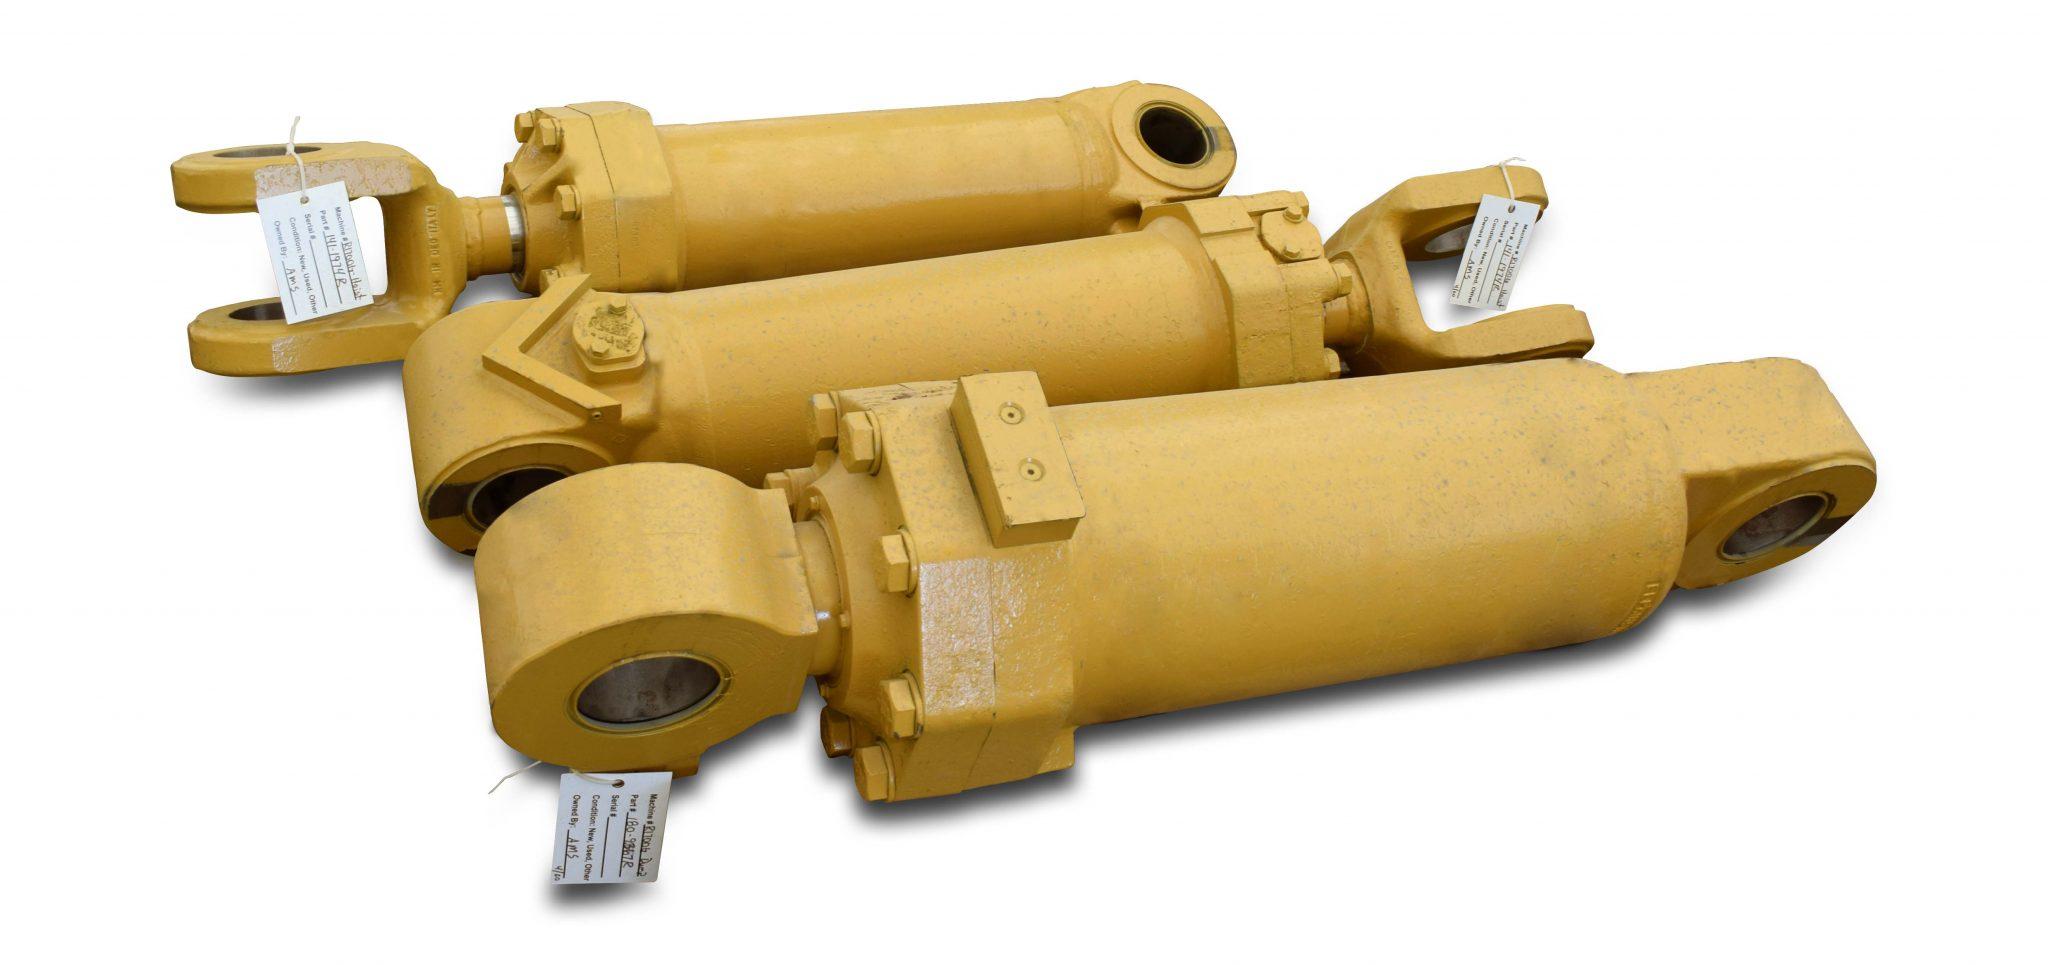 Rebuilt Dump & Hoist Cylinders